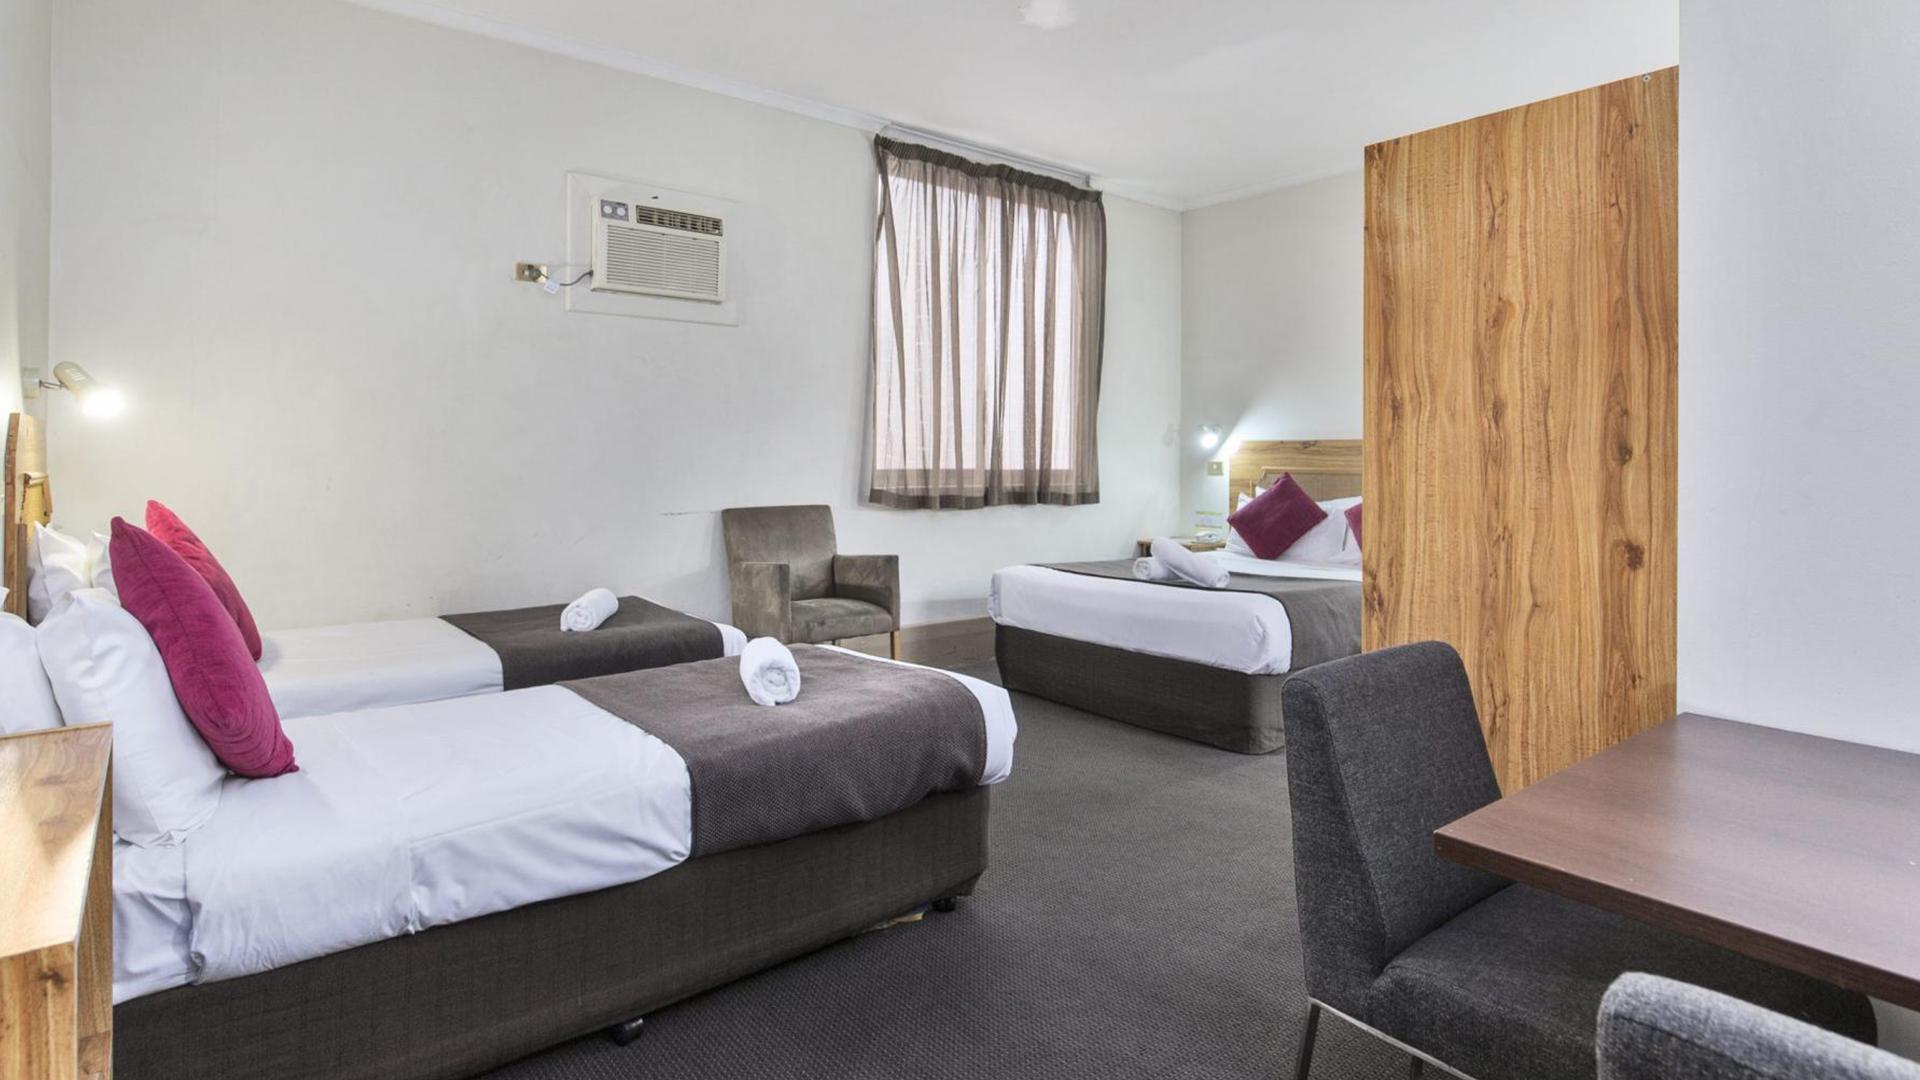 Family Room image 1 at Adelaide Paringa by Adelaide City Council, South Australia, Australia